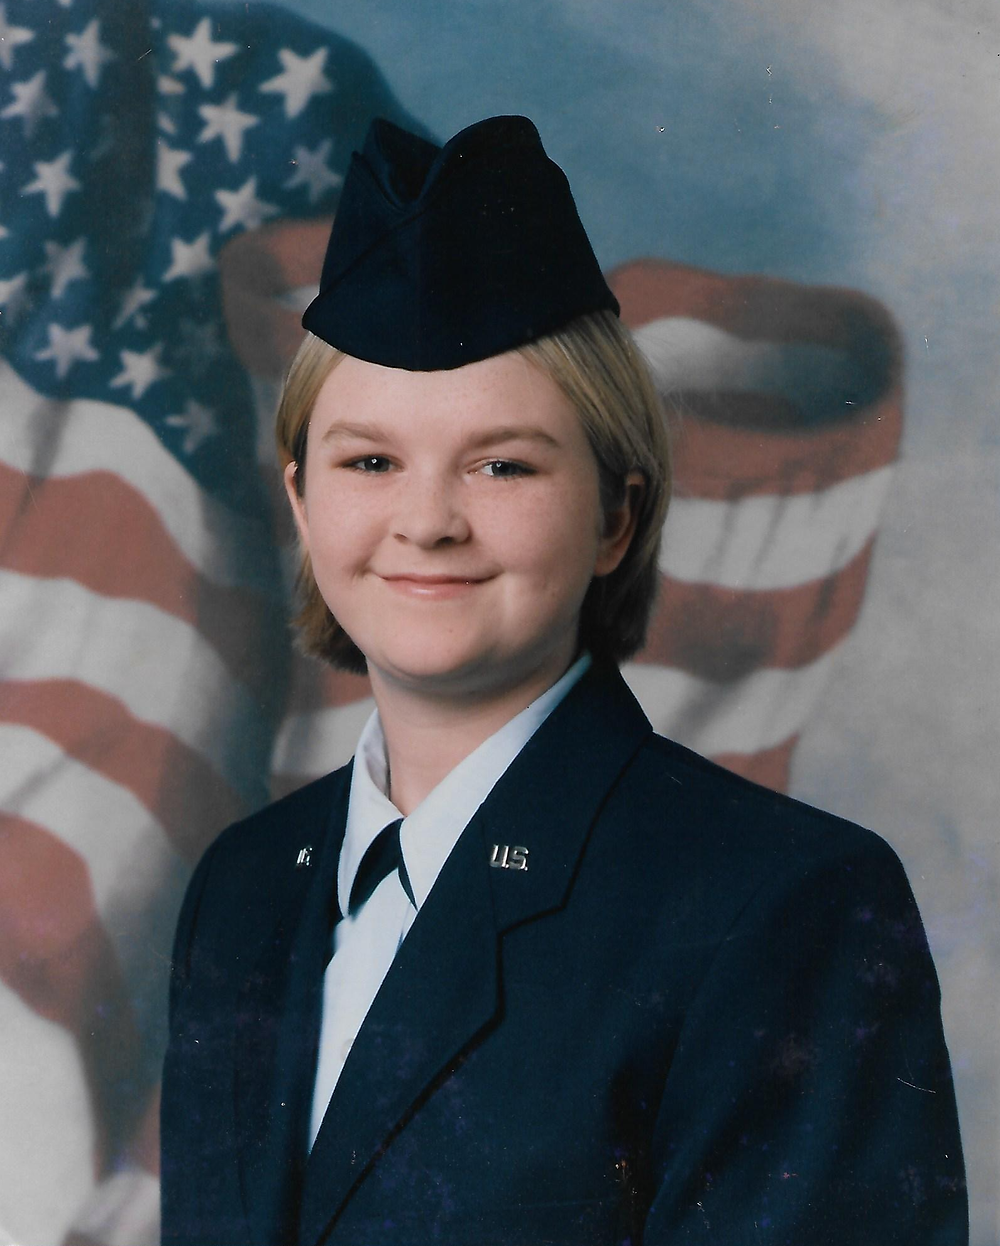 2001 USAF Basic Training Graduation Picture